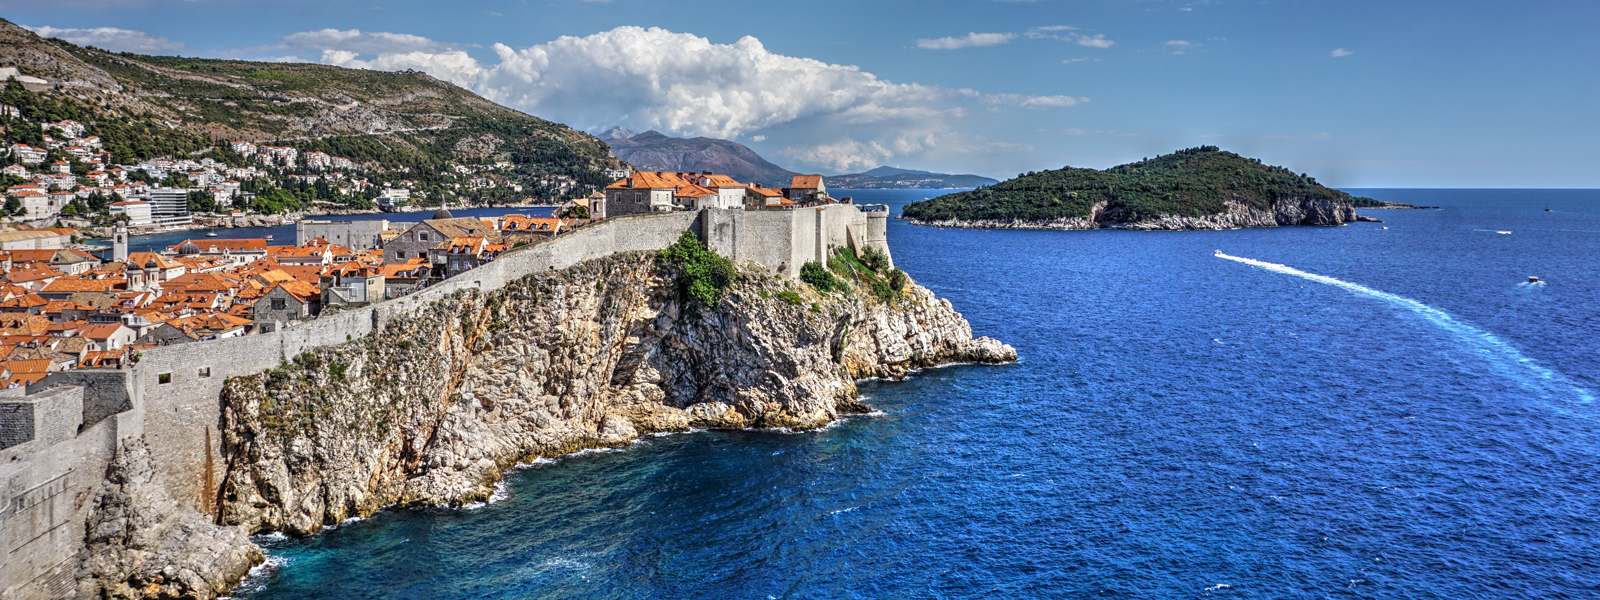 Croatia is Spectacular!